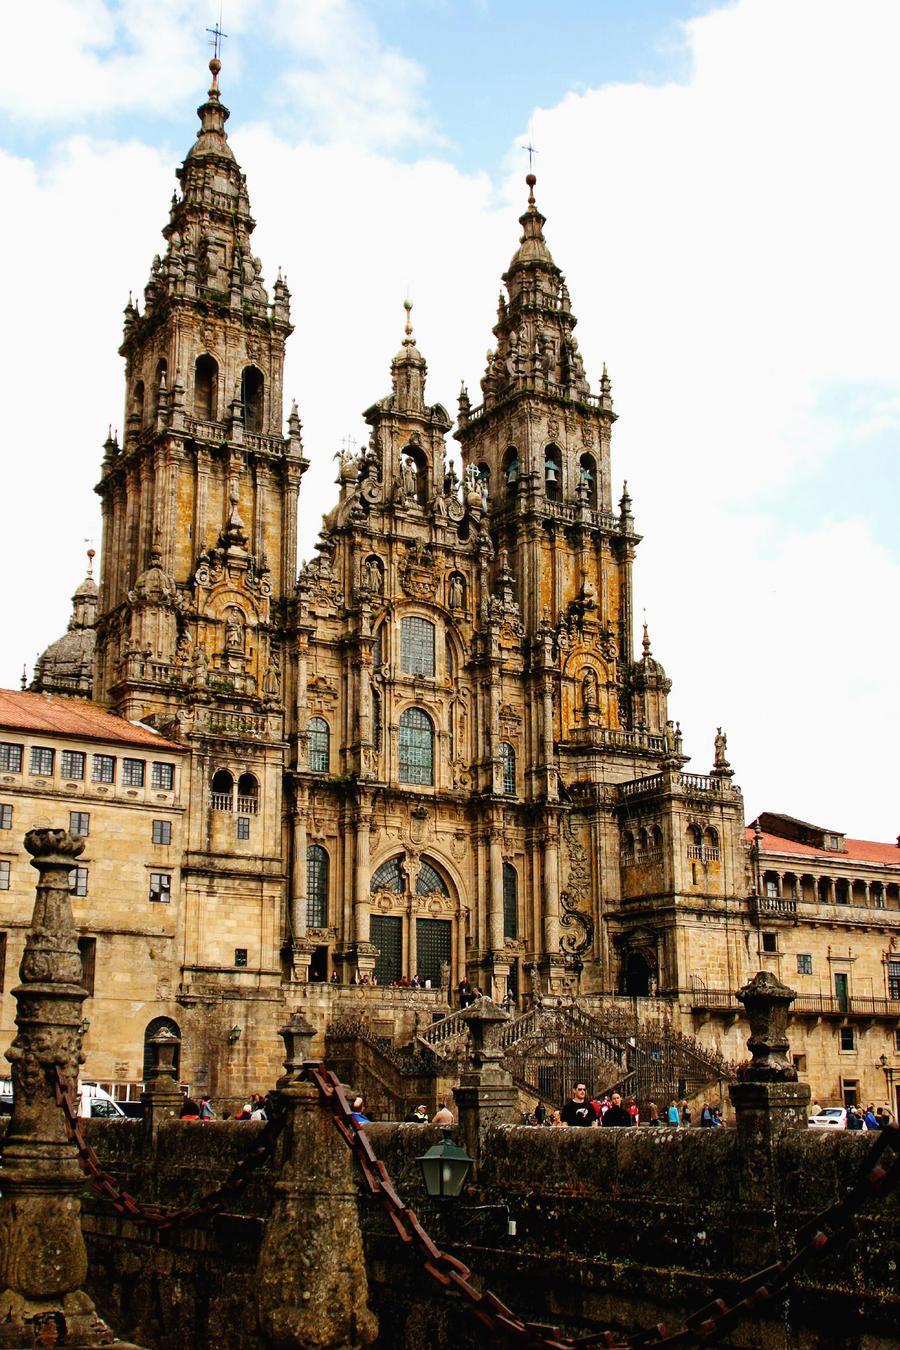 Santiago de Compostela - Cathedral - Catedral by REI-BCN on DeviantArt